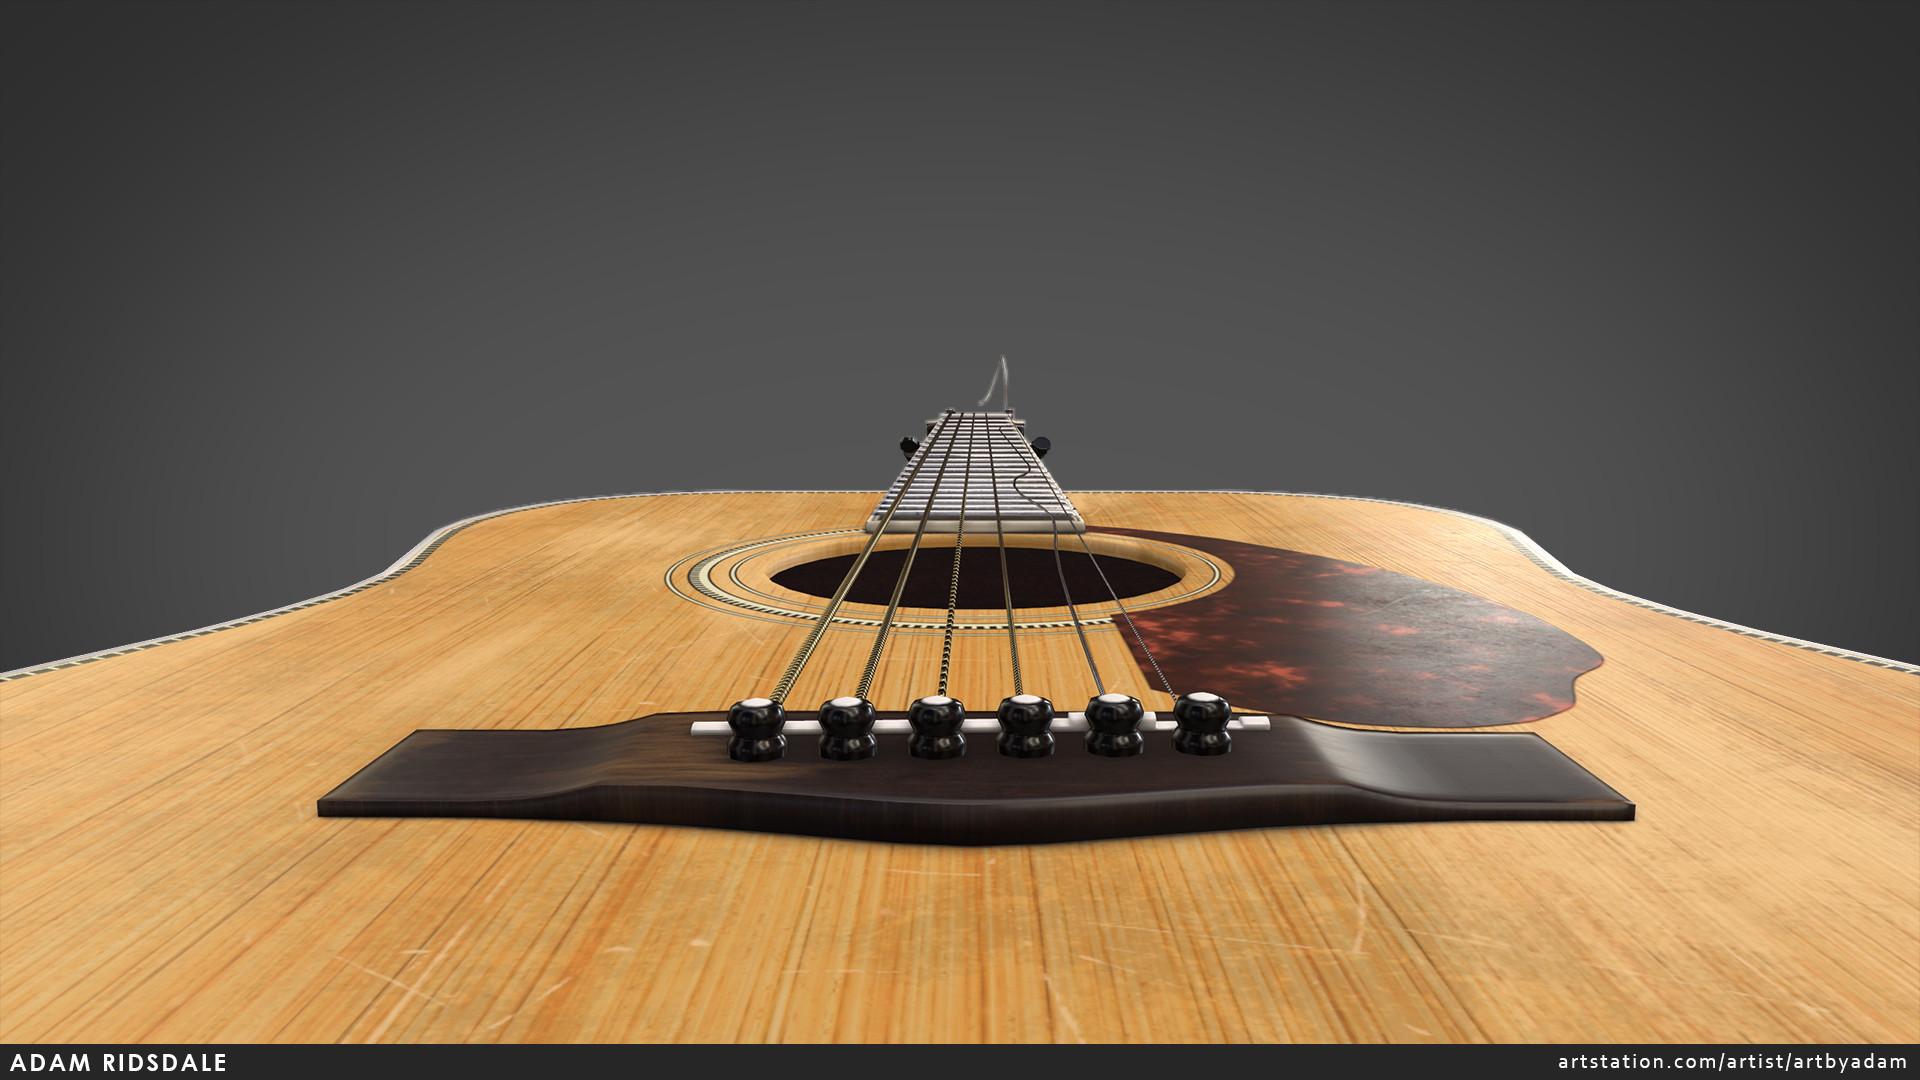 Adam ridsdale guitar05